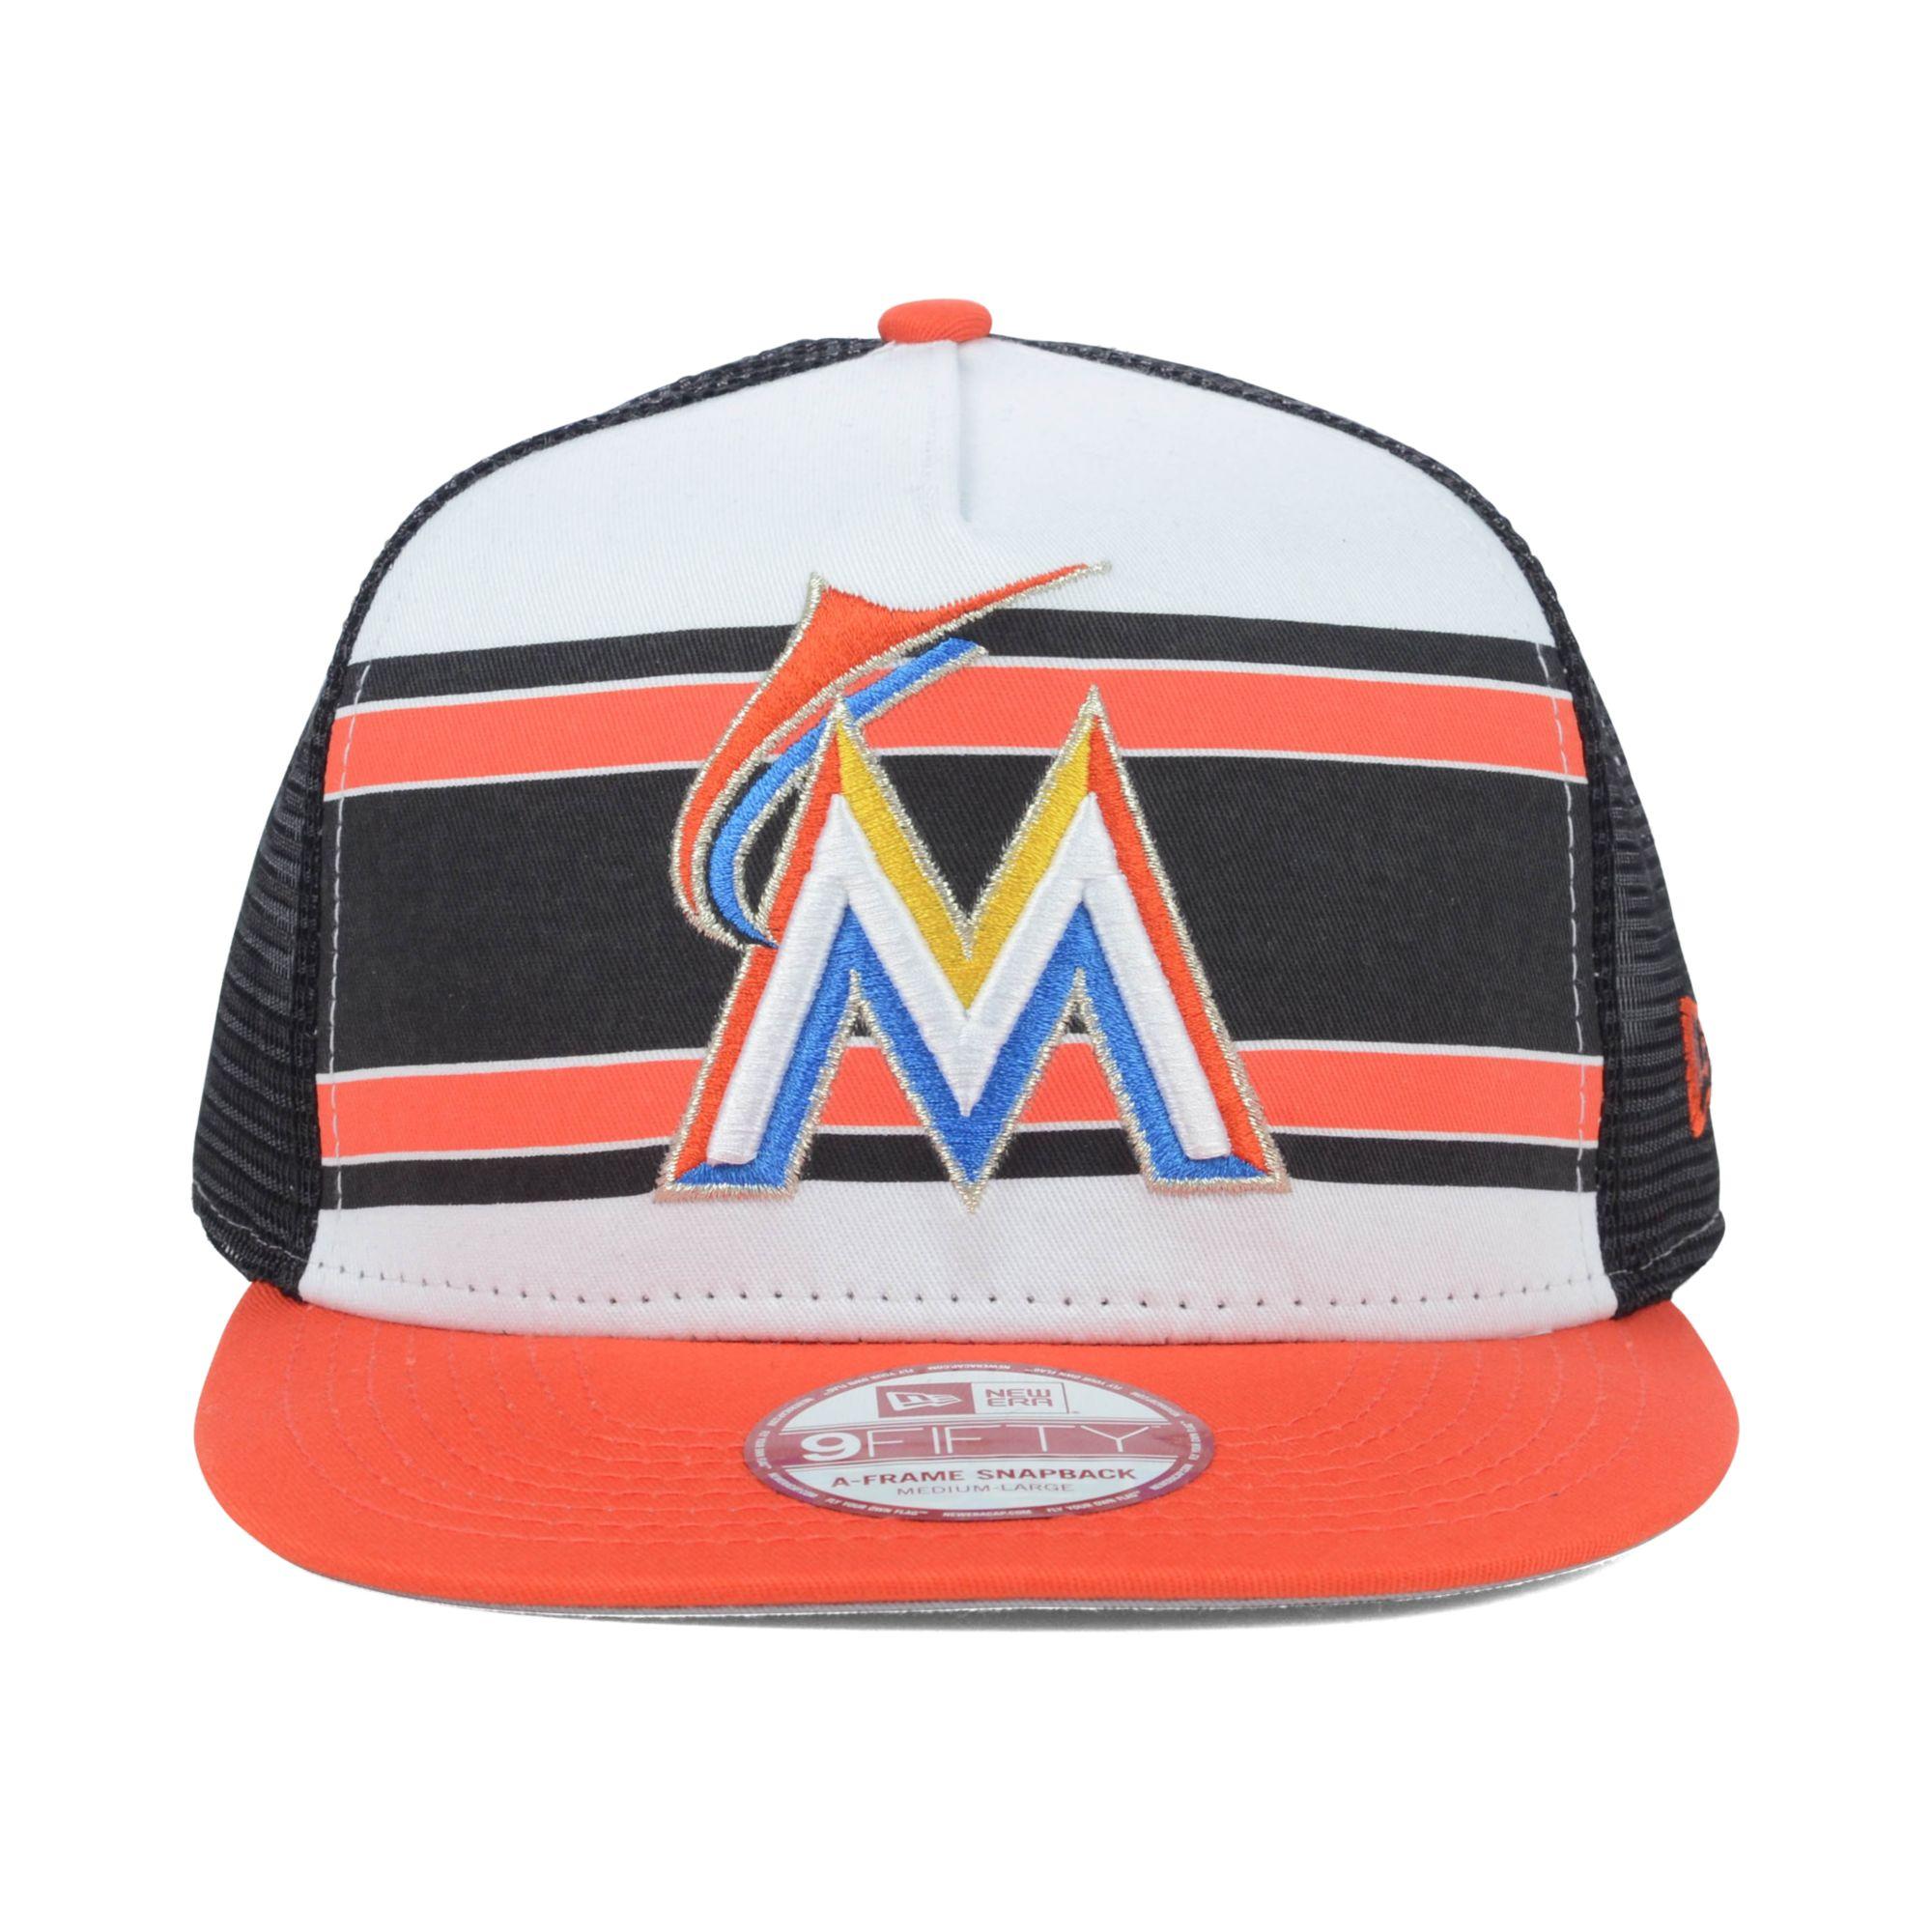 low priced f44e1 08436 KTZ Miami Marlins Mlb Band Slap 9fifty Snapback Cap for Men - Lyst